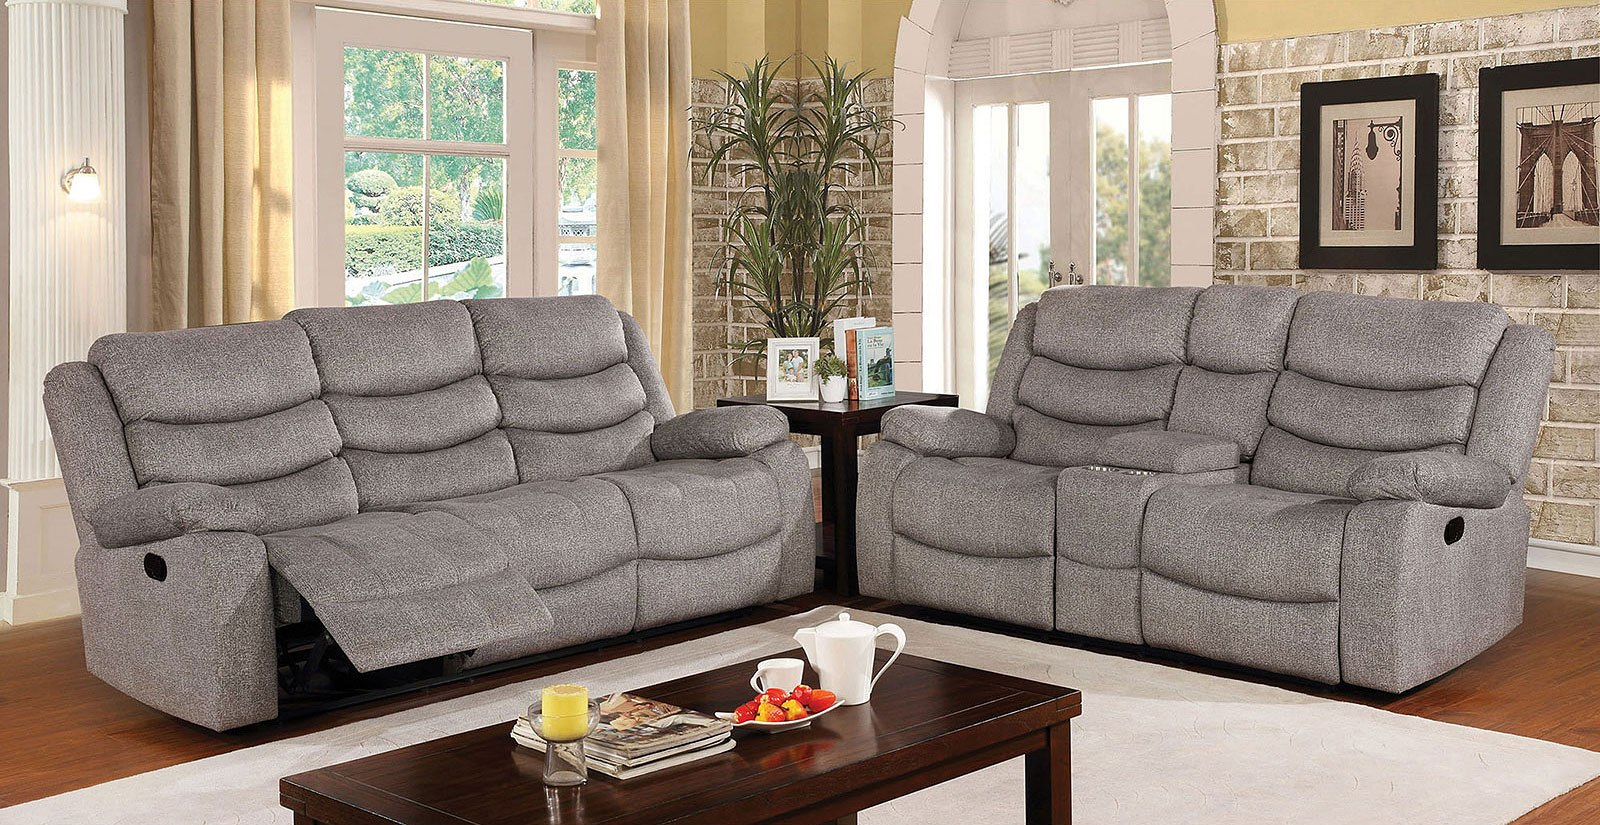 castleford reclining living room set furniture of america